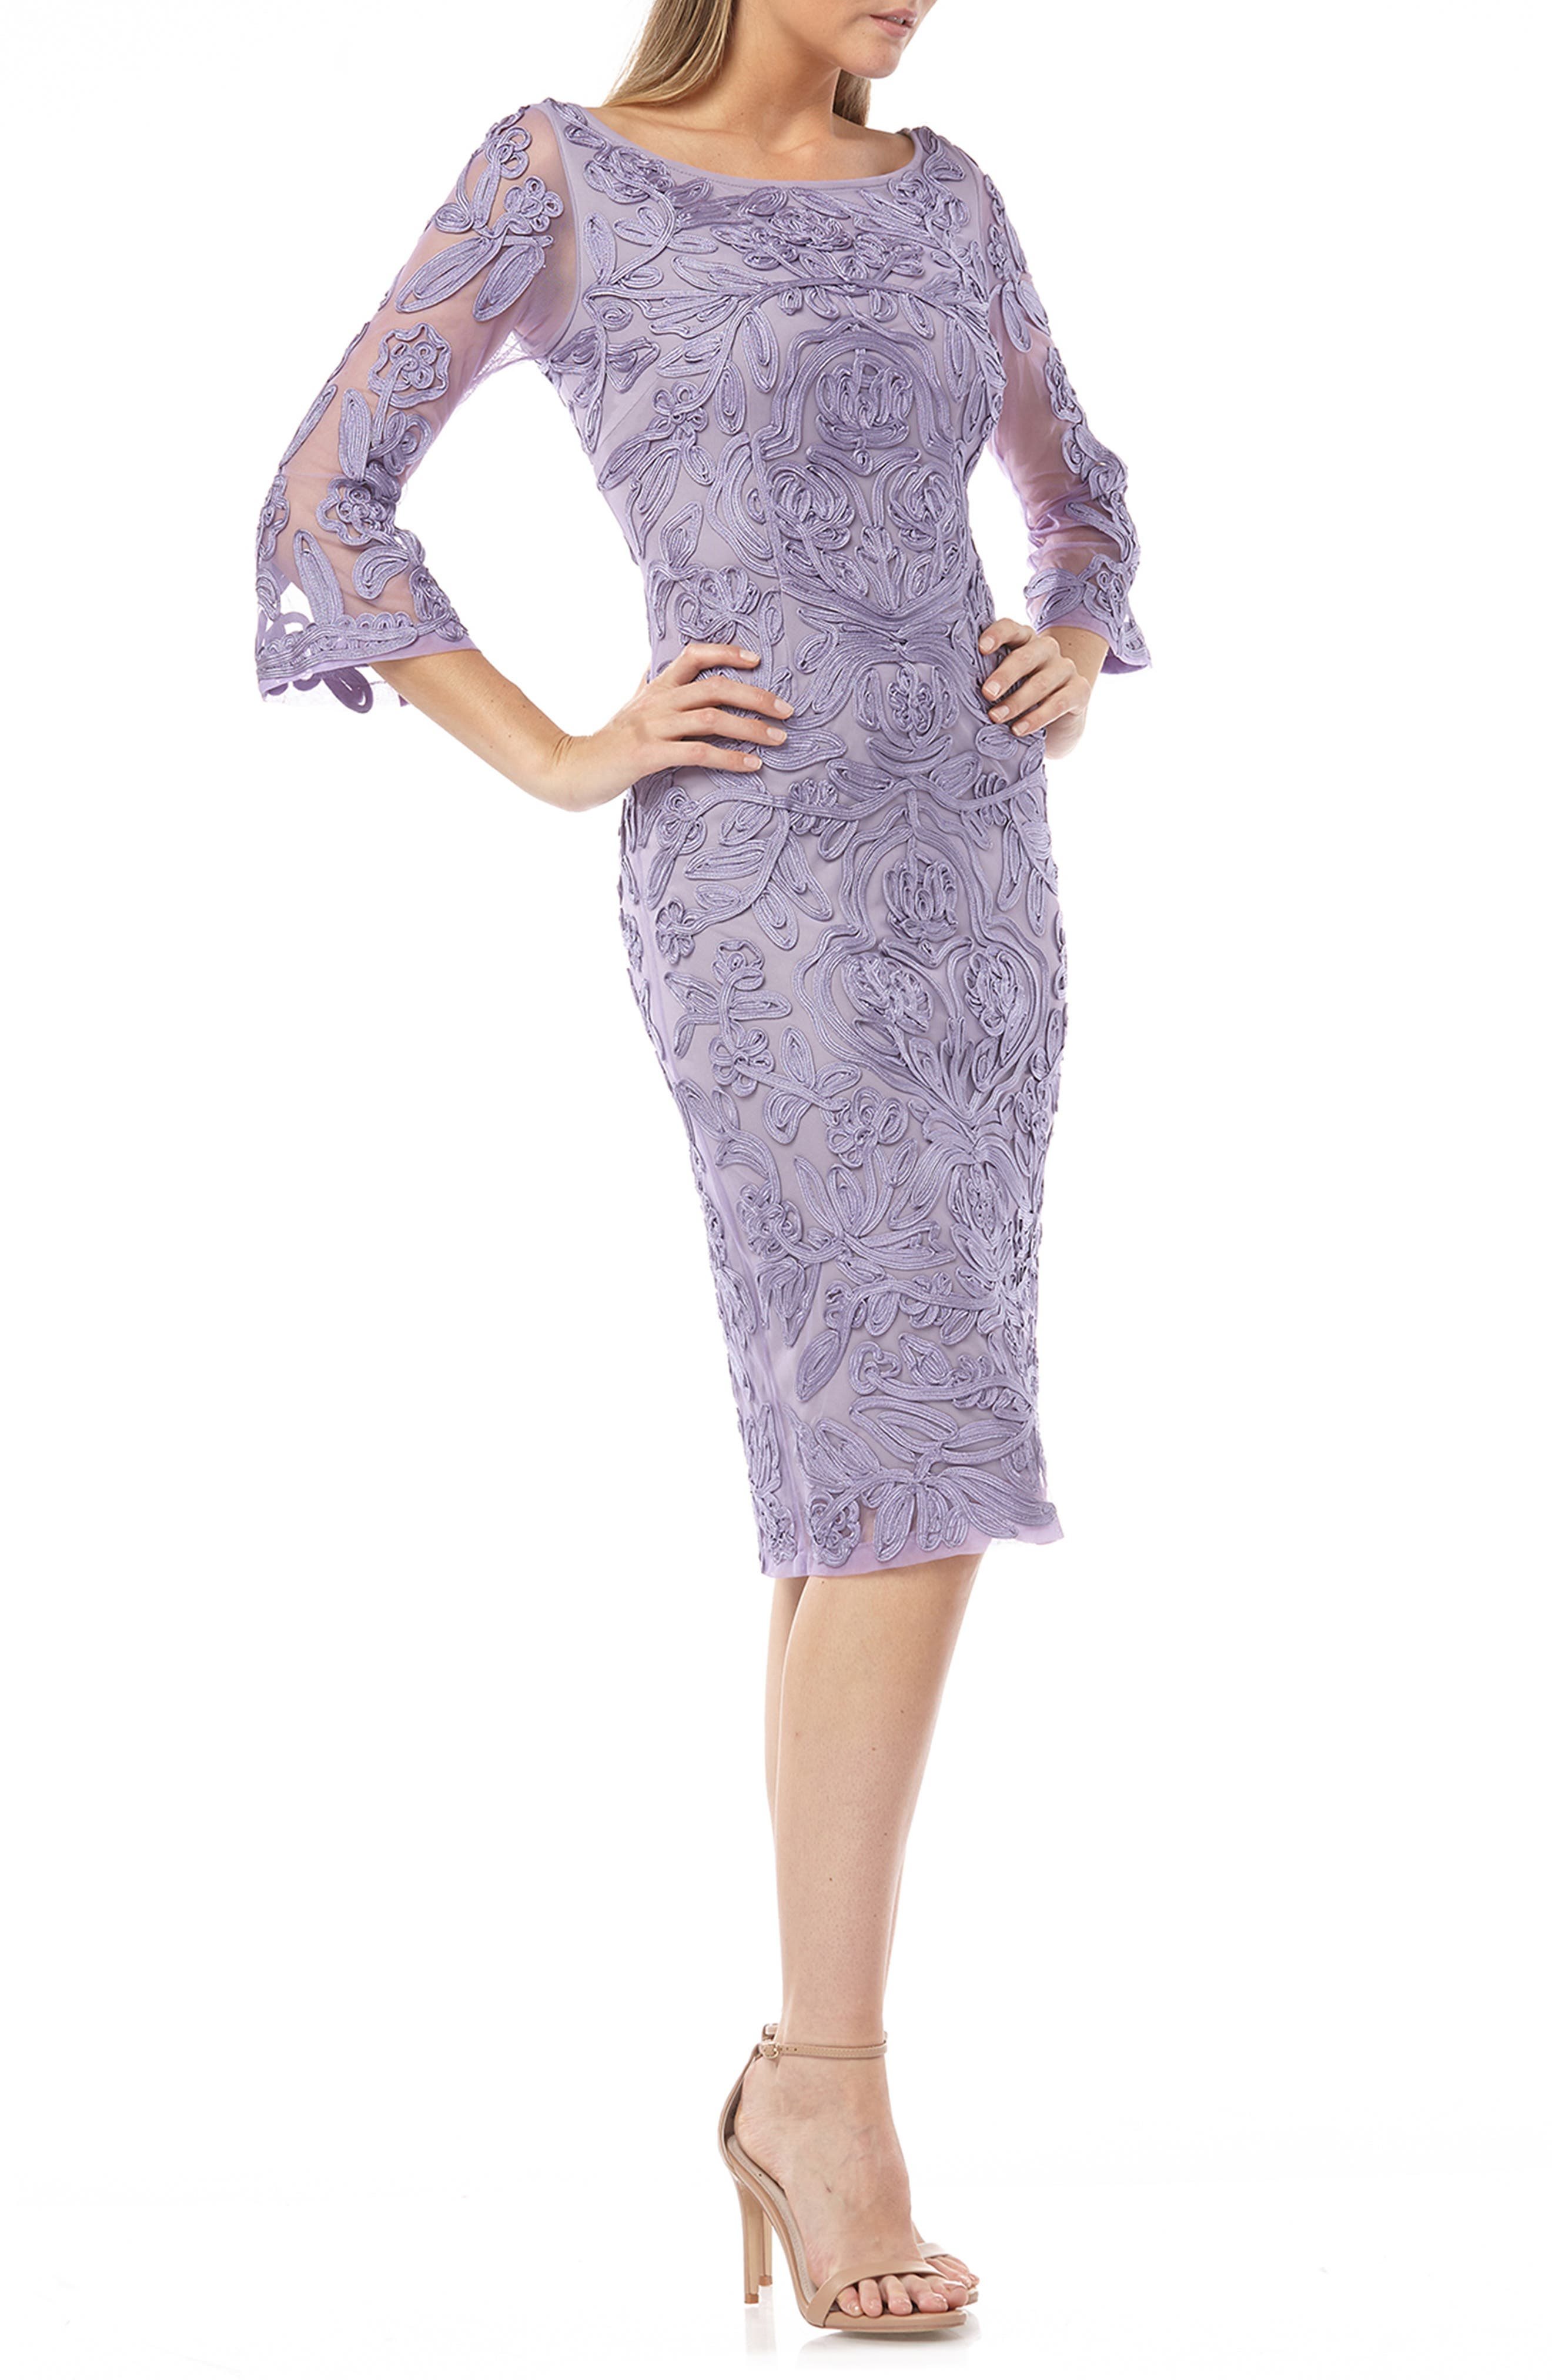 Js Collections Soutache Chiffon Sheath Dress, Purple